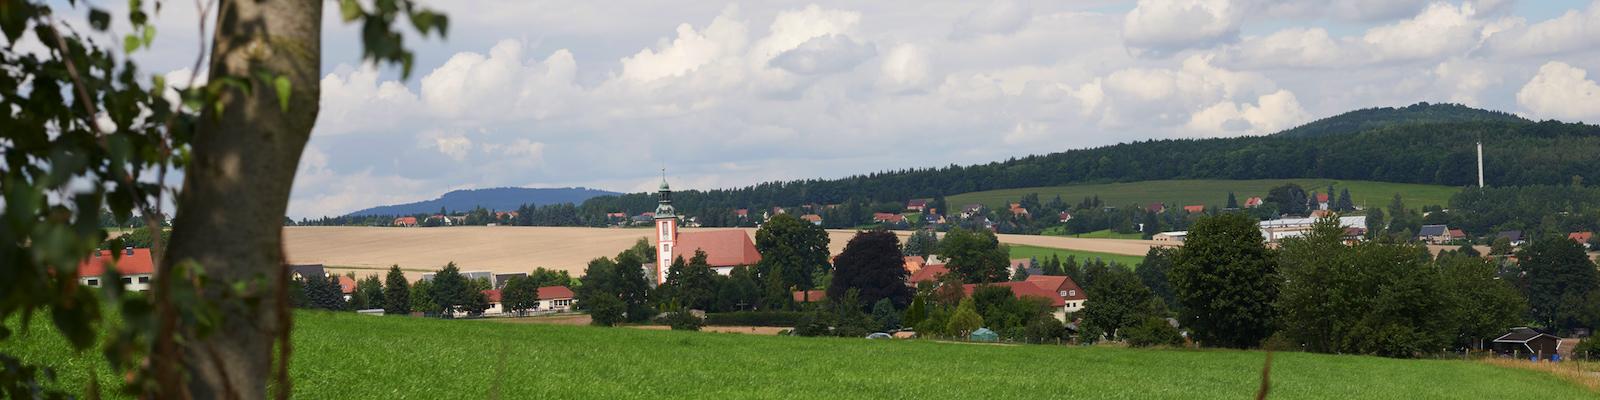 Zittau - Spreeborn - Karasekhöhle - Schloss Hainewalde